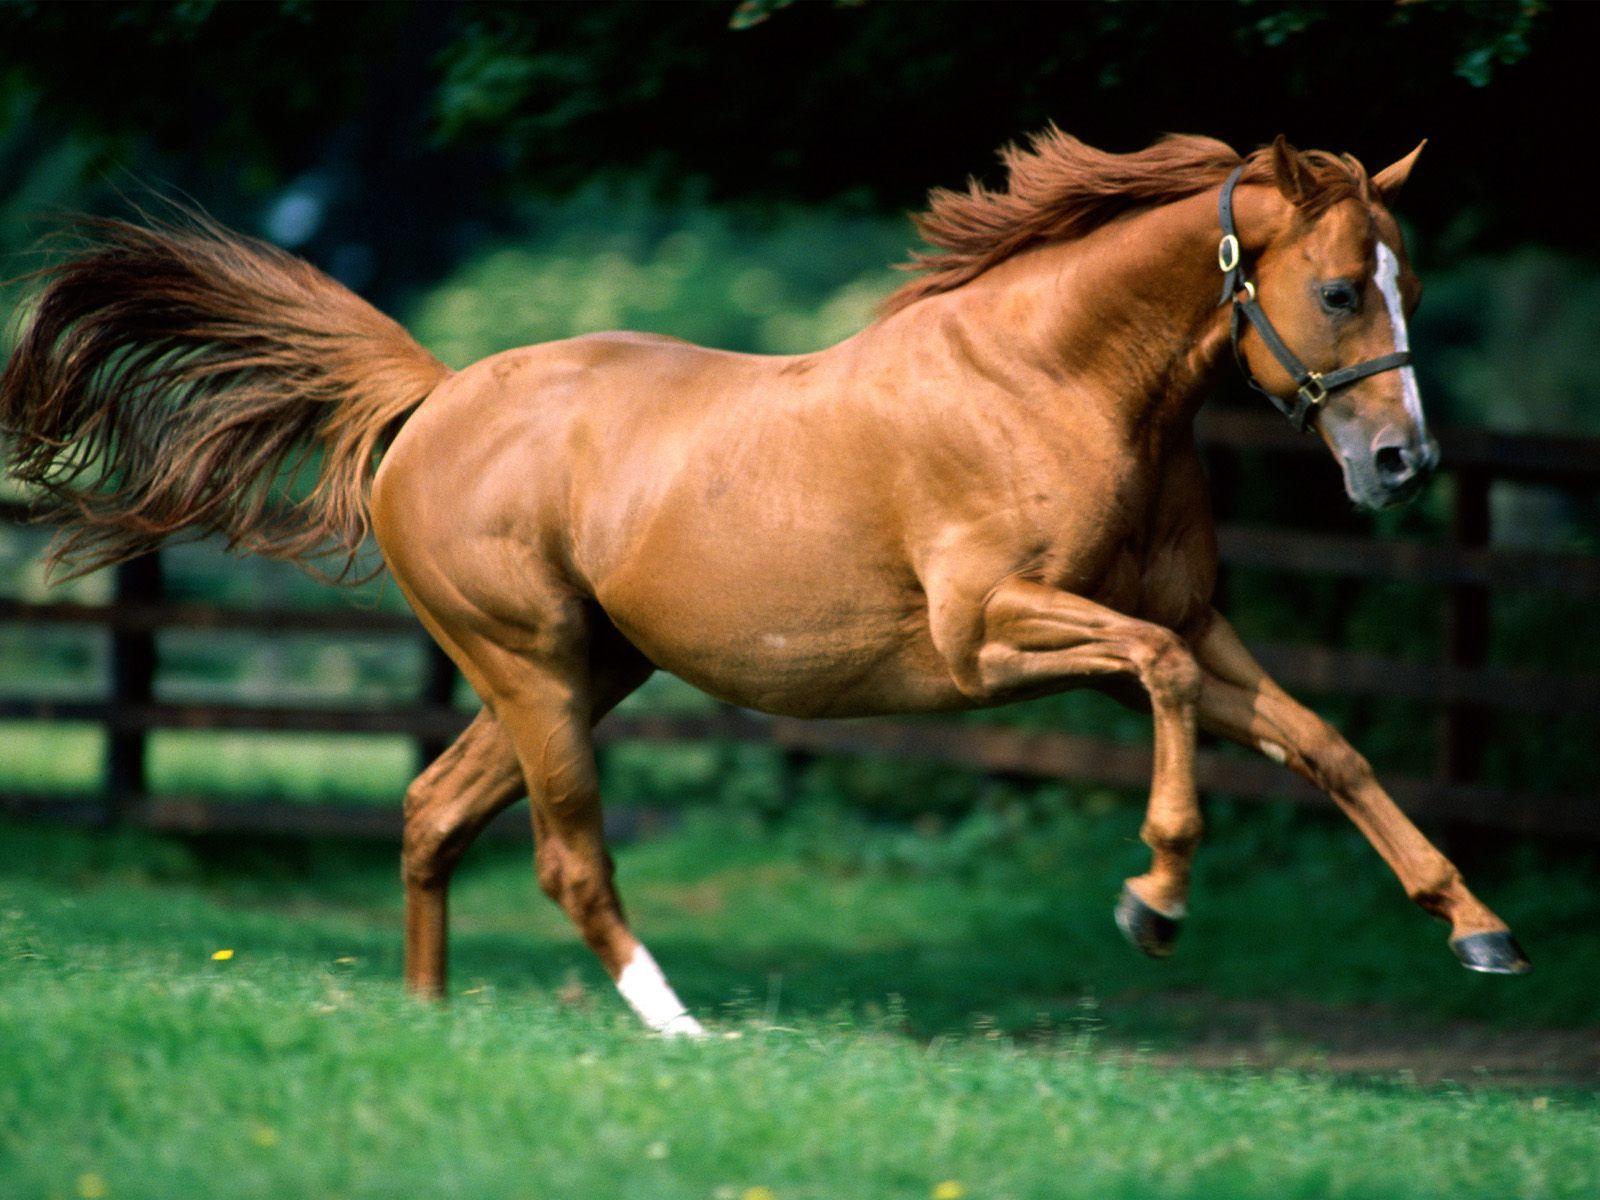 Running Horses Wallpapers For Desktop Backgrounds Kuda Cantik